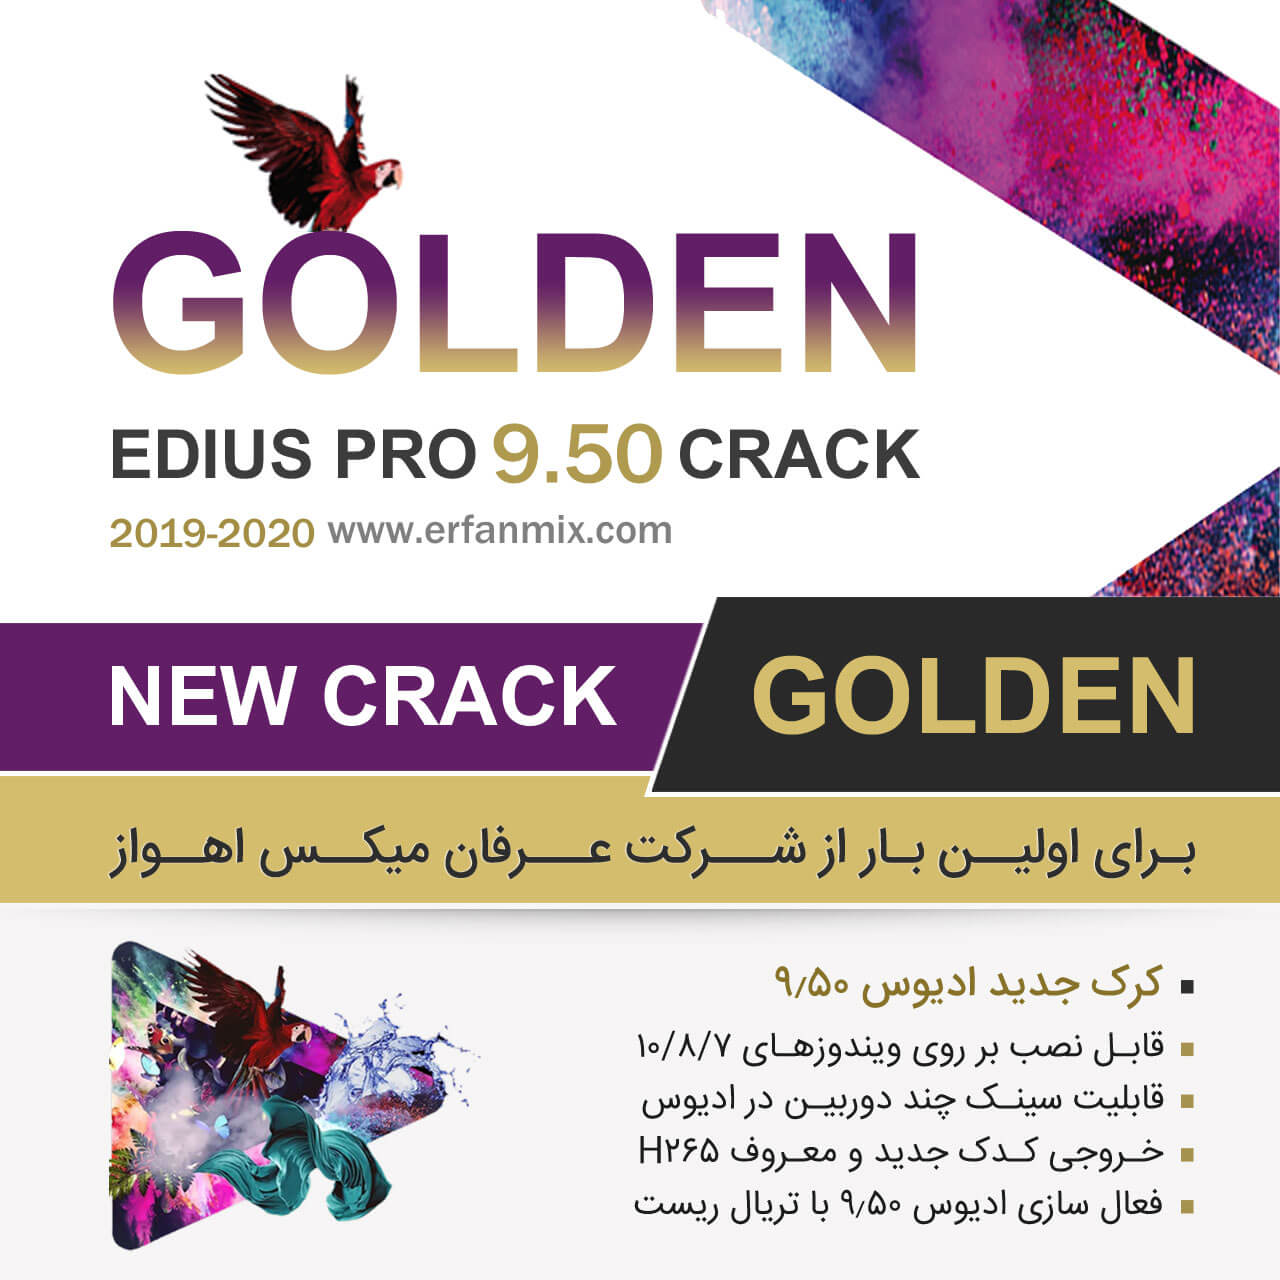 کرک جدید ادیوس 9.50 نسخه گلدن